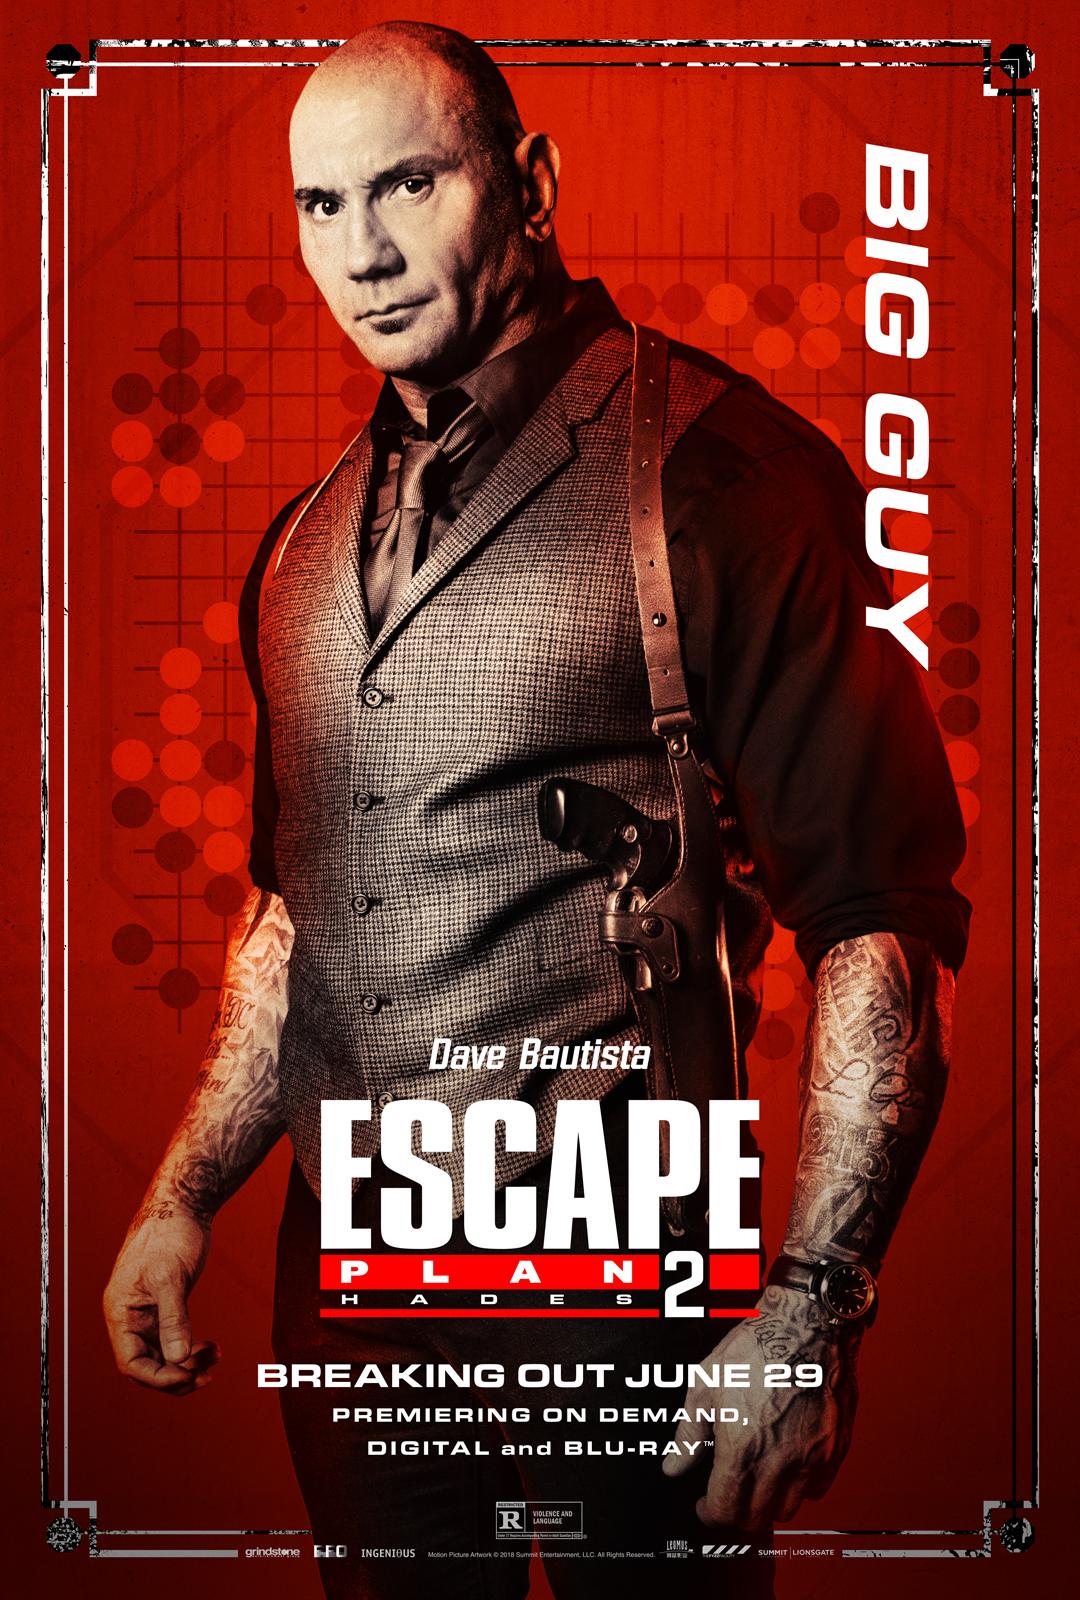 Dave Bautista in Escape Plan 2: Hades (2018)